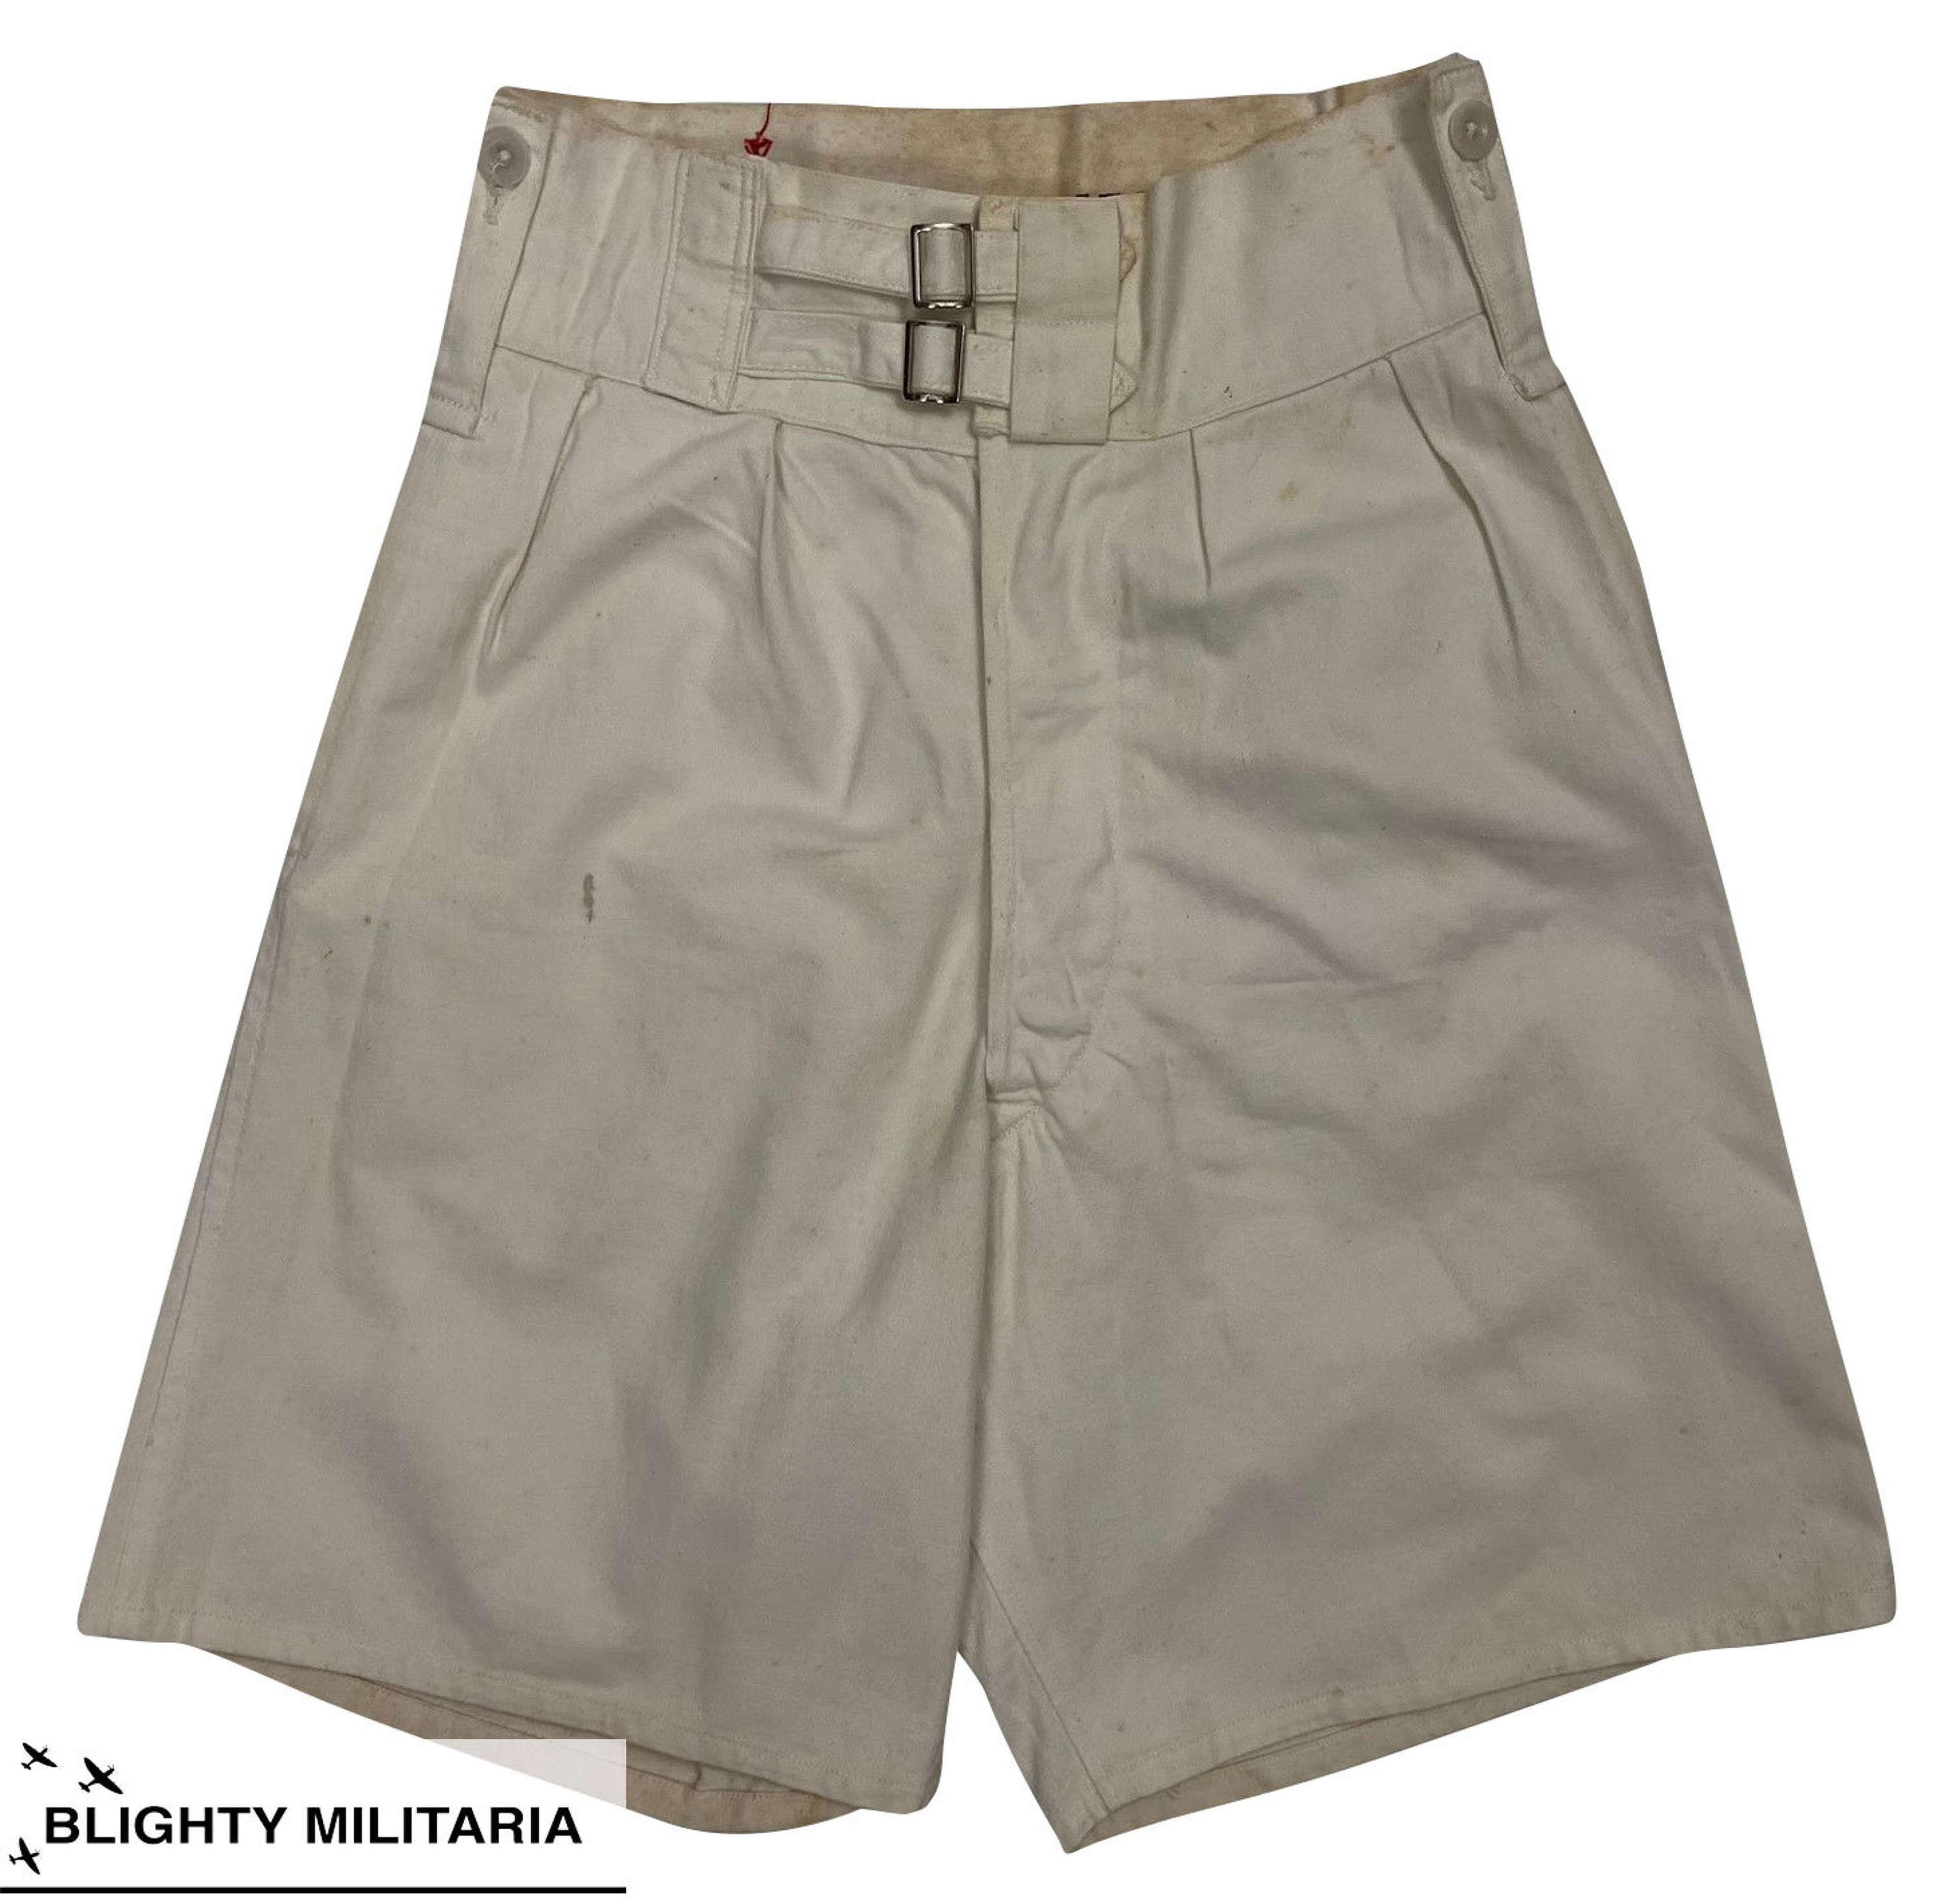 Original 1950s Royal Navy Tropical White Shorts